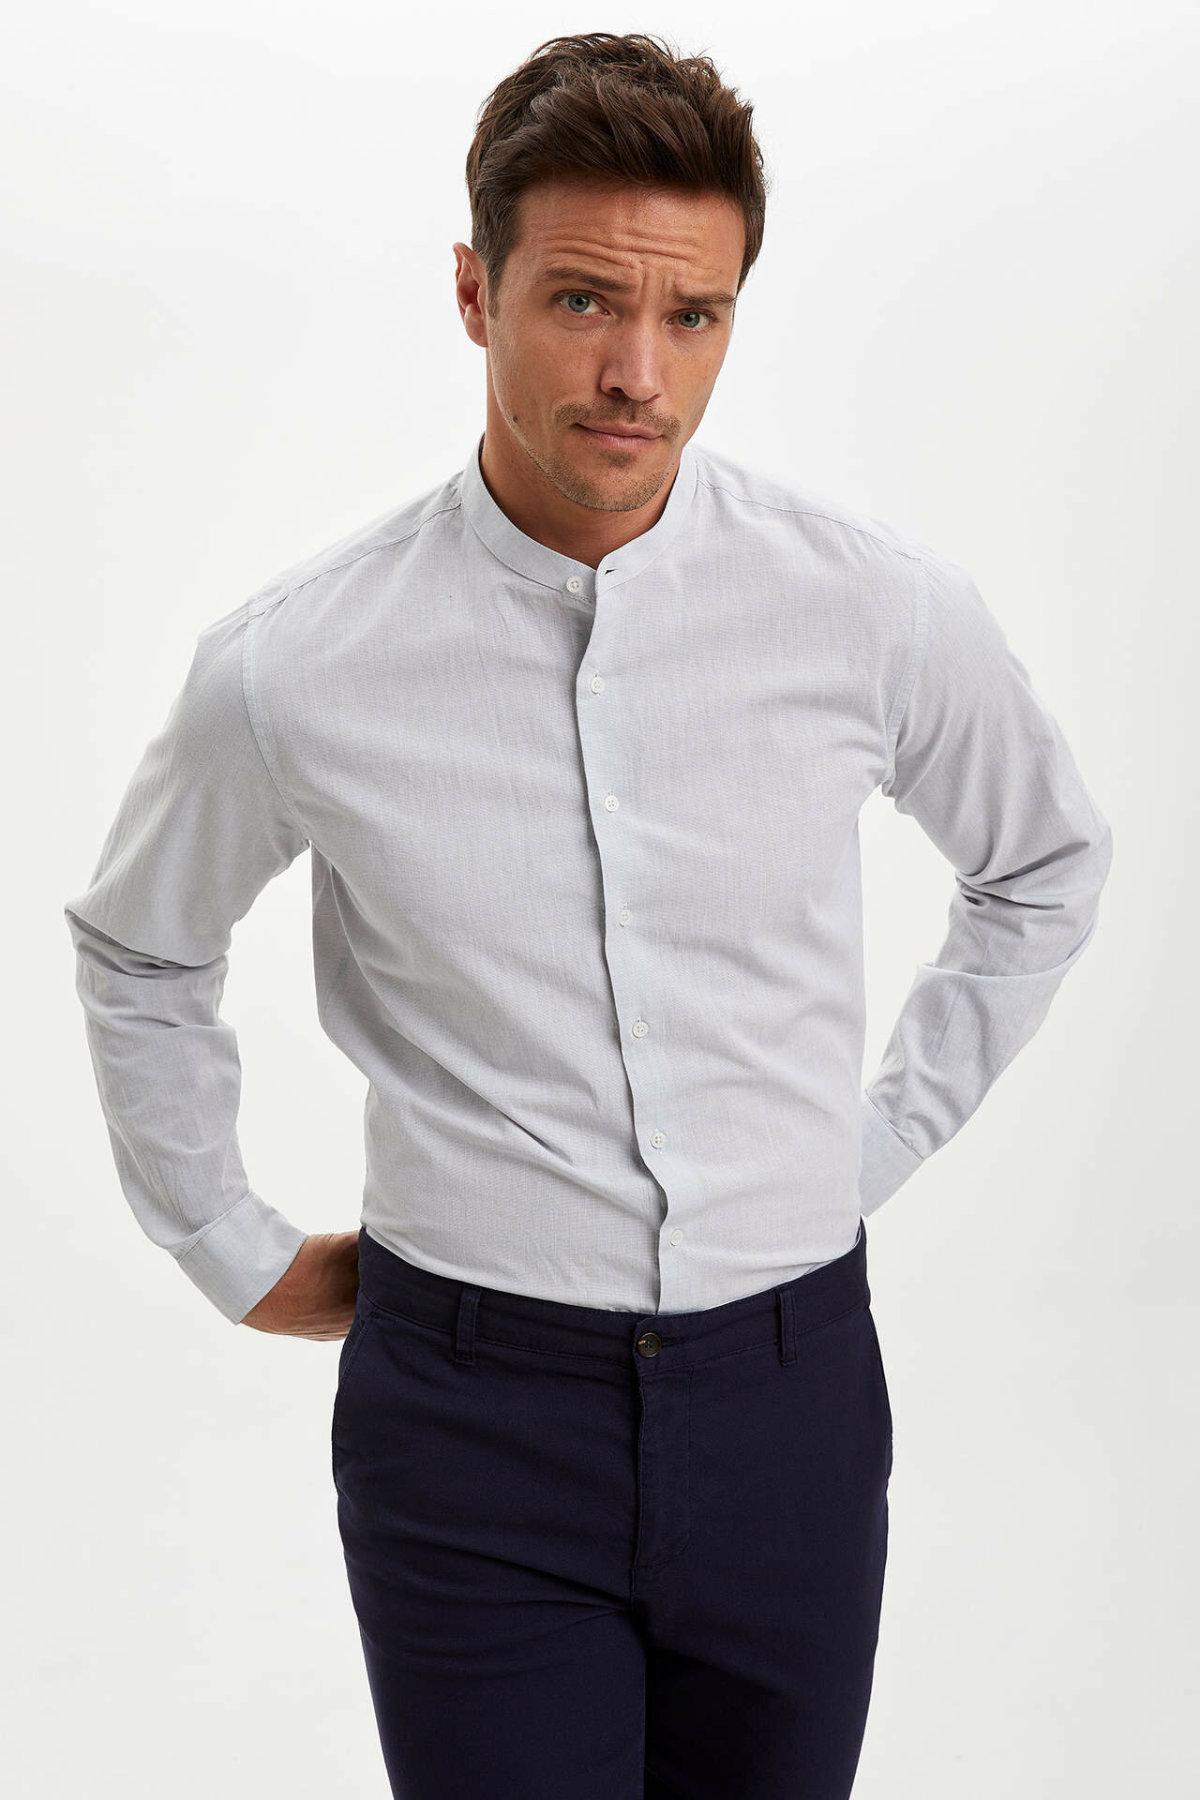 DeFacto Man Long Sleeve Shirt Men's Solid Color Shirts Men's Summer Shirts Men's Smart Casual Shirt -N6362AZ20SM